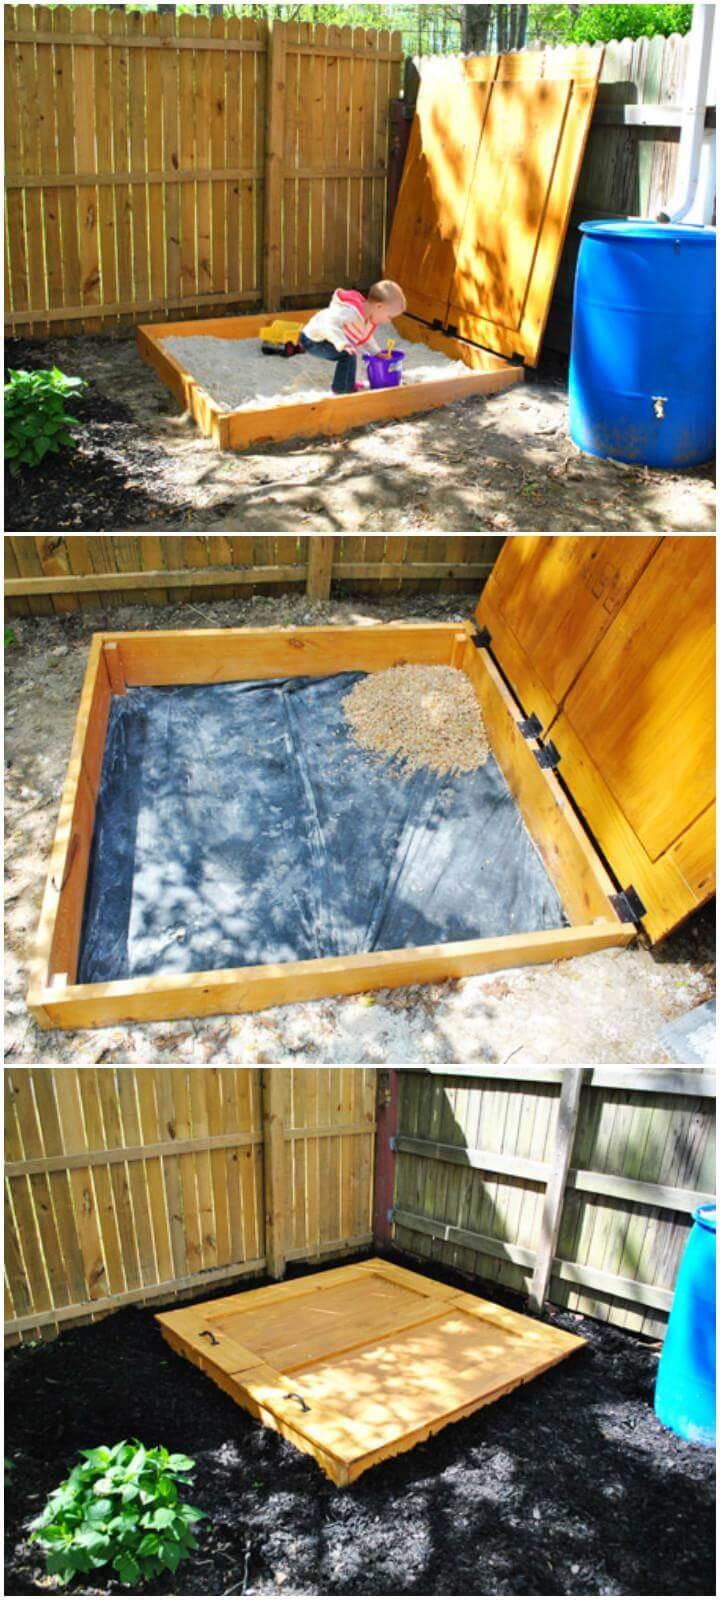 Caja de arena de madera maciza de bricolaje con tapa con bisagras